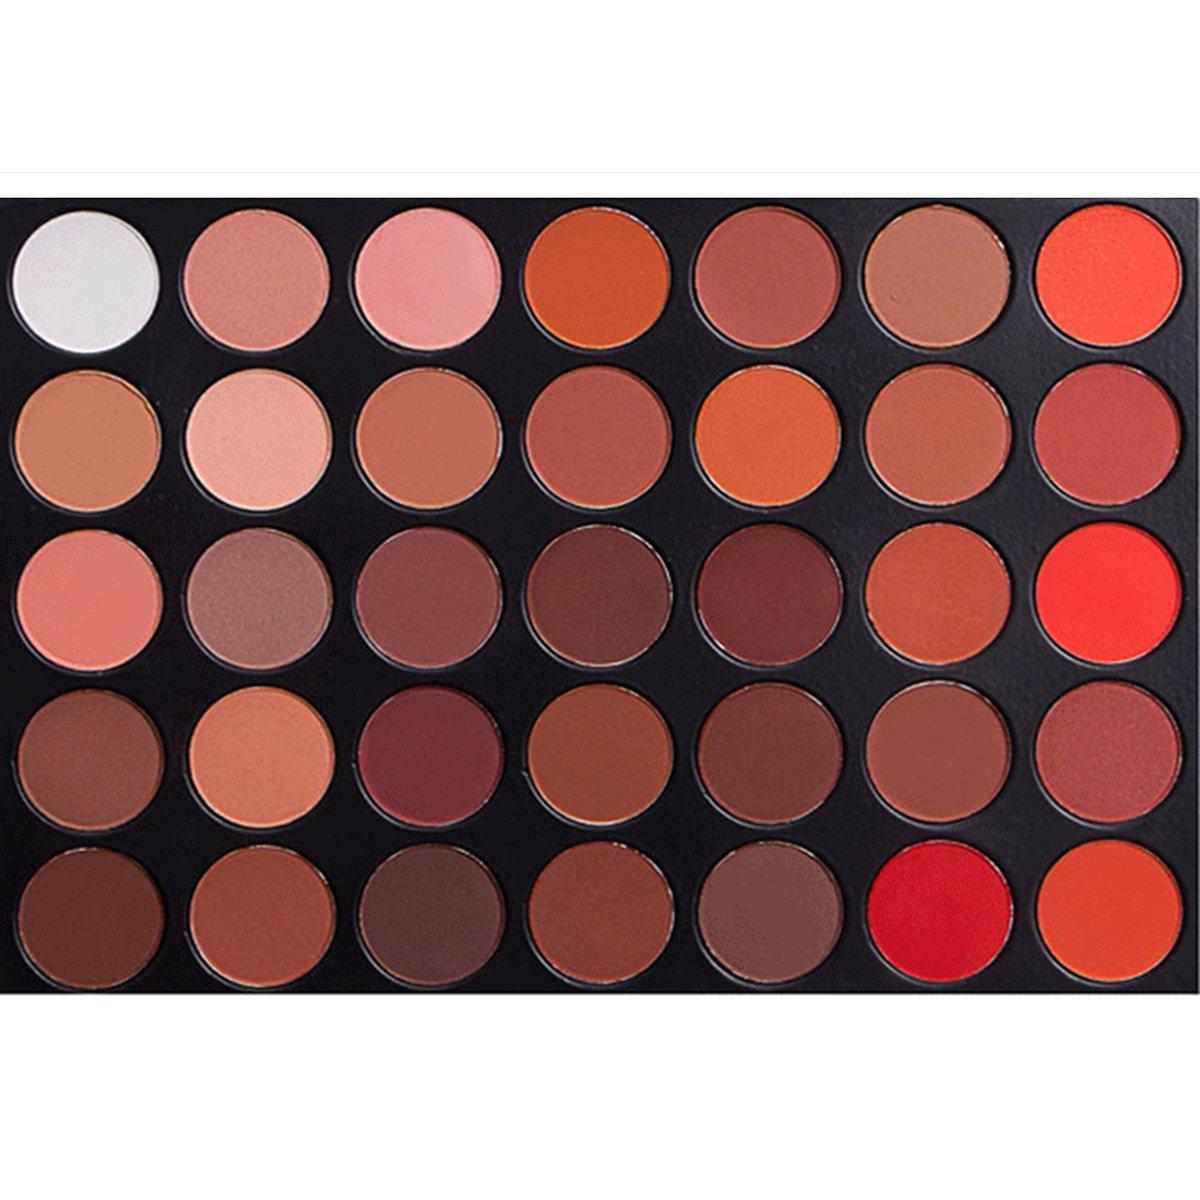 MISKOS 35 Colors Eyeshadow Palette, All Matte Warm Pigmented 35OM Makeup Eye shadow Palettes Natural Makeup Set